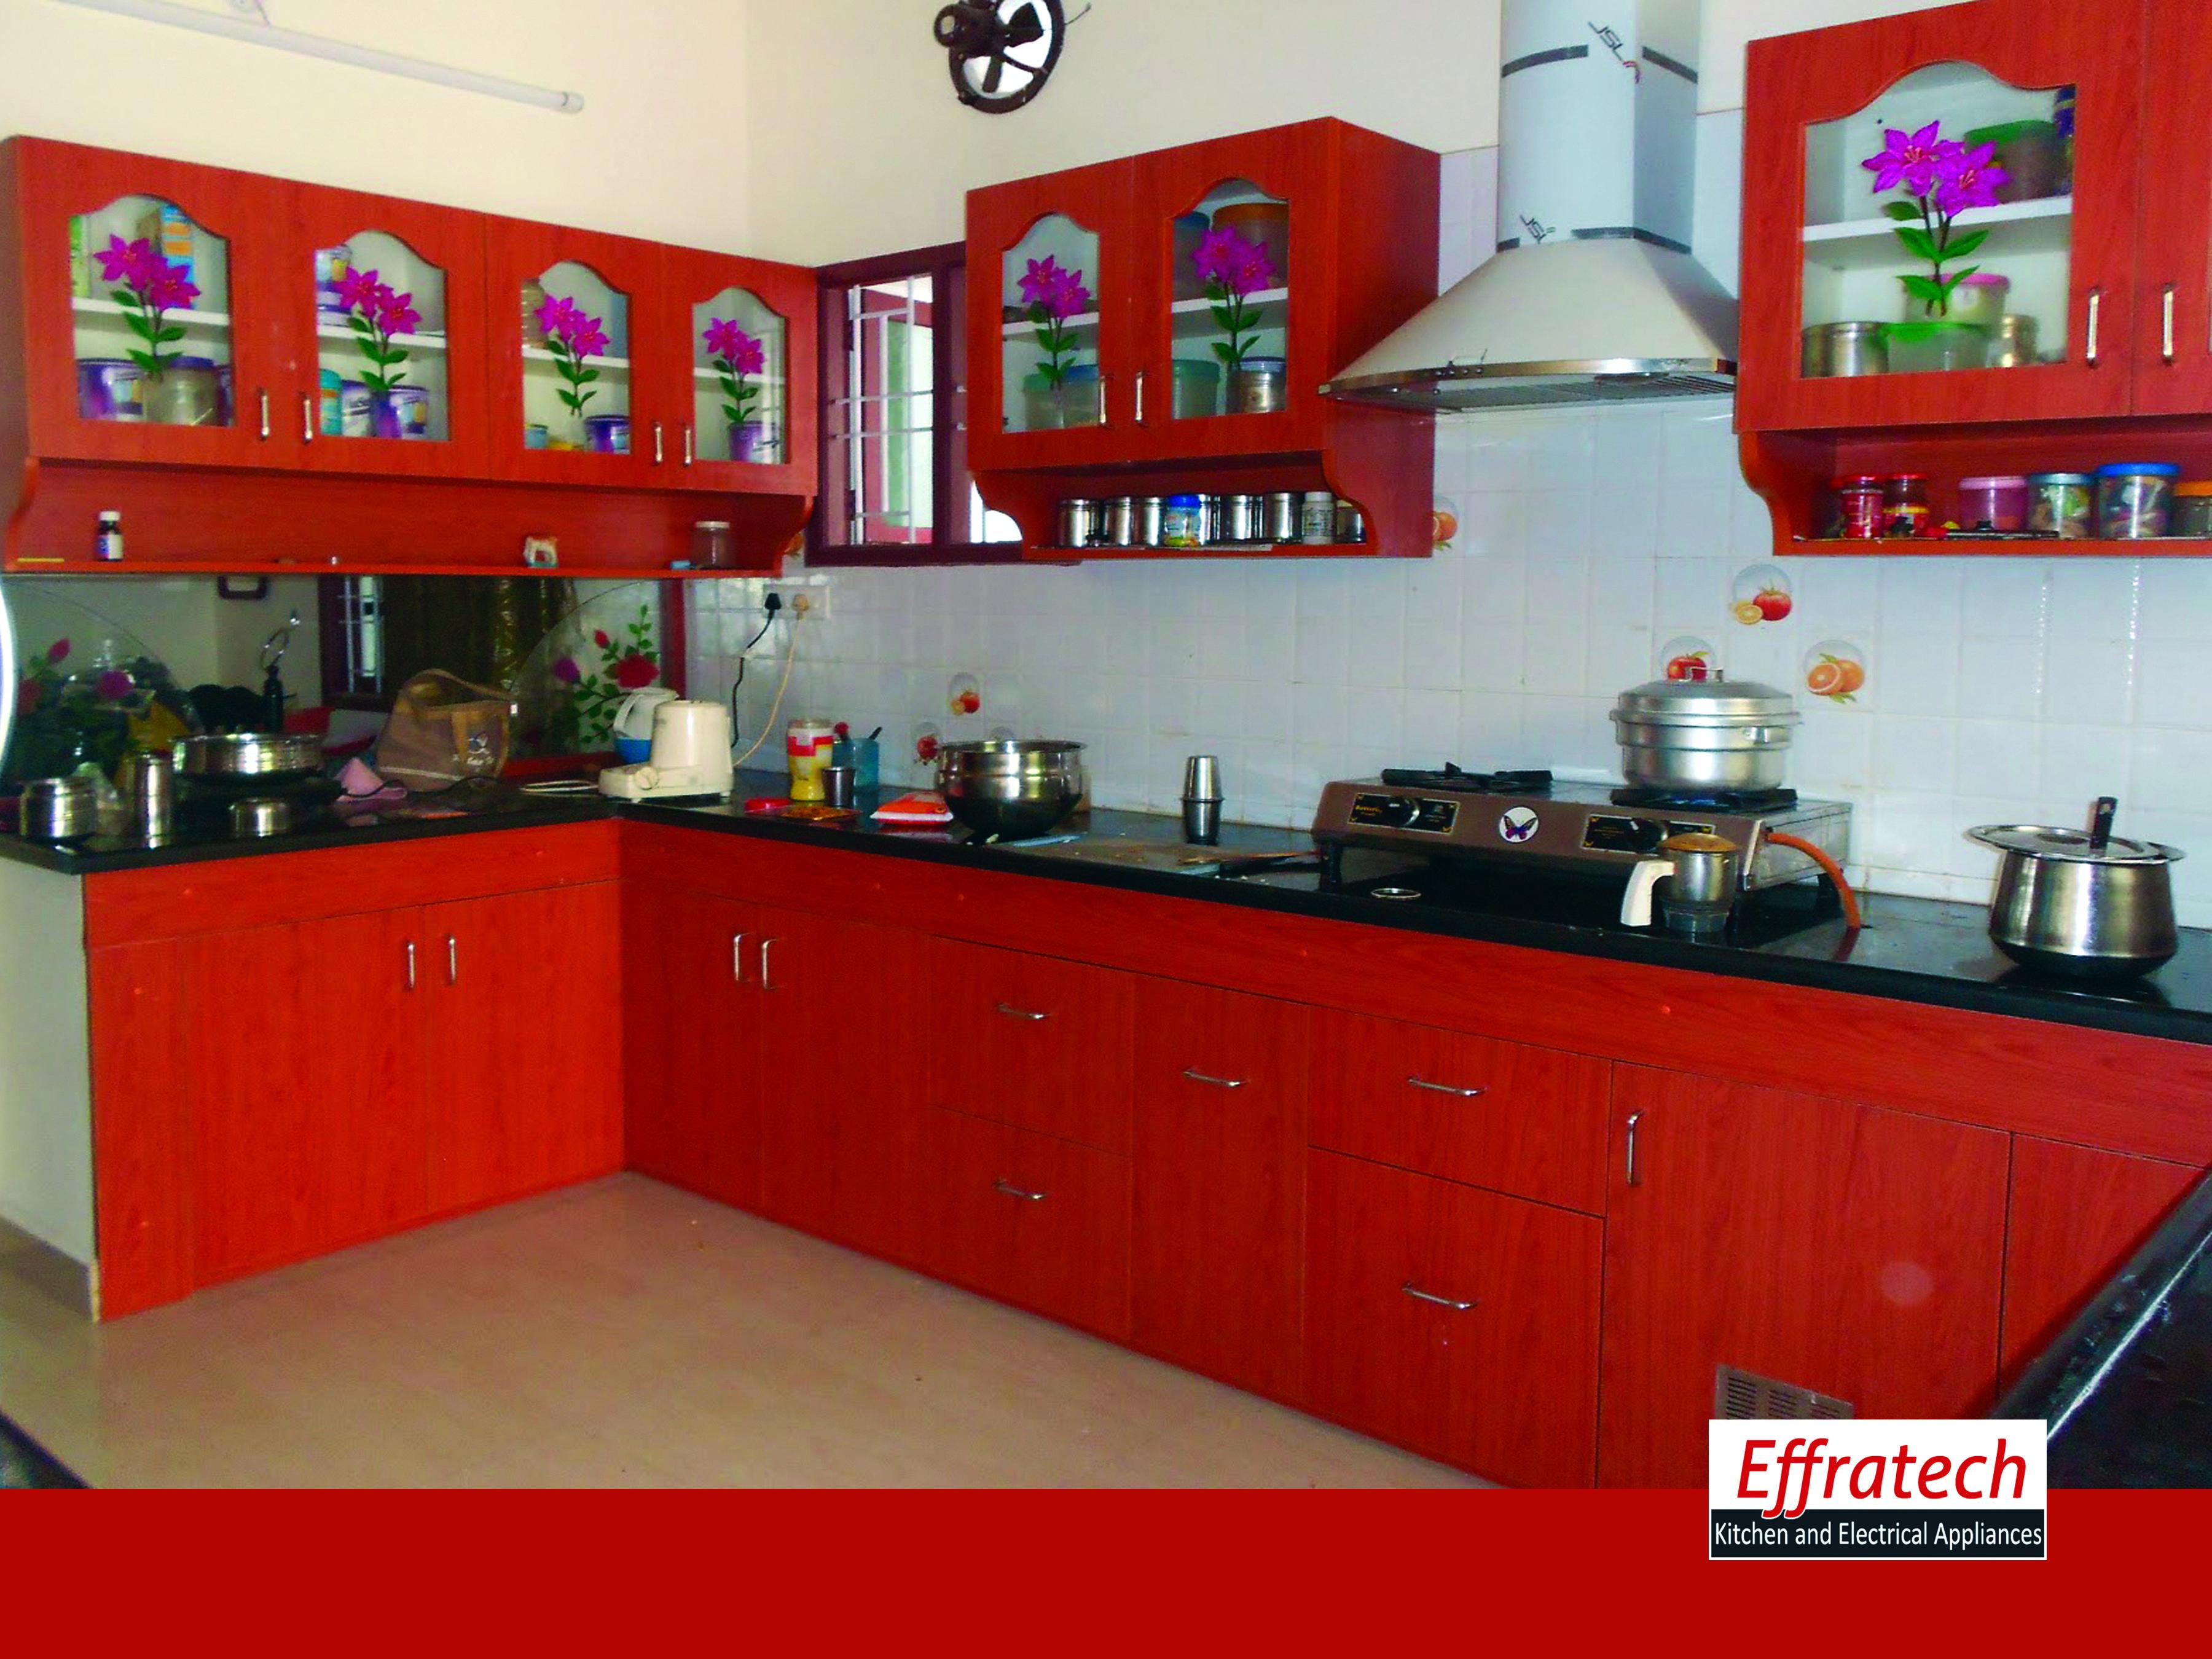 Set 1 Length 145 Square Feet Wood Type Marine Plywood Basket 5 Price Rs 246000 Kitchen Range Hood Stylish Kitchen Kitchen